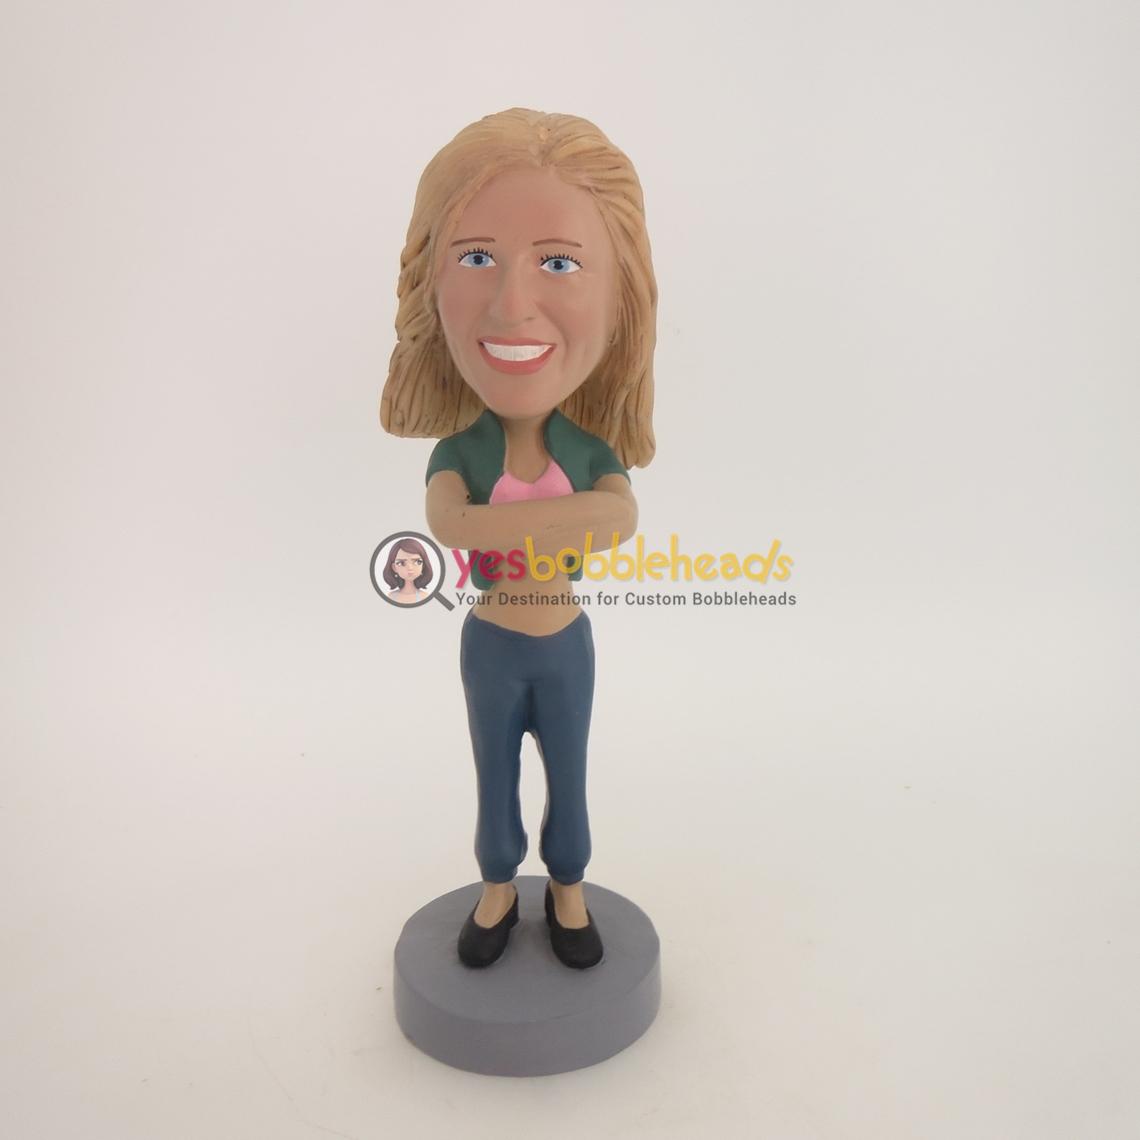 Picture of Custom Bobblehead Doll: Cardigan Girl